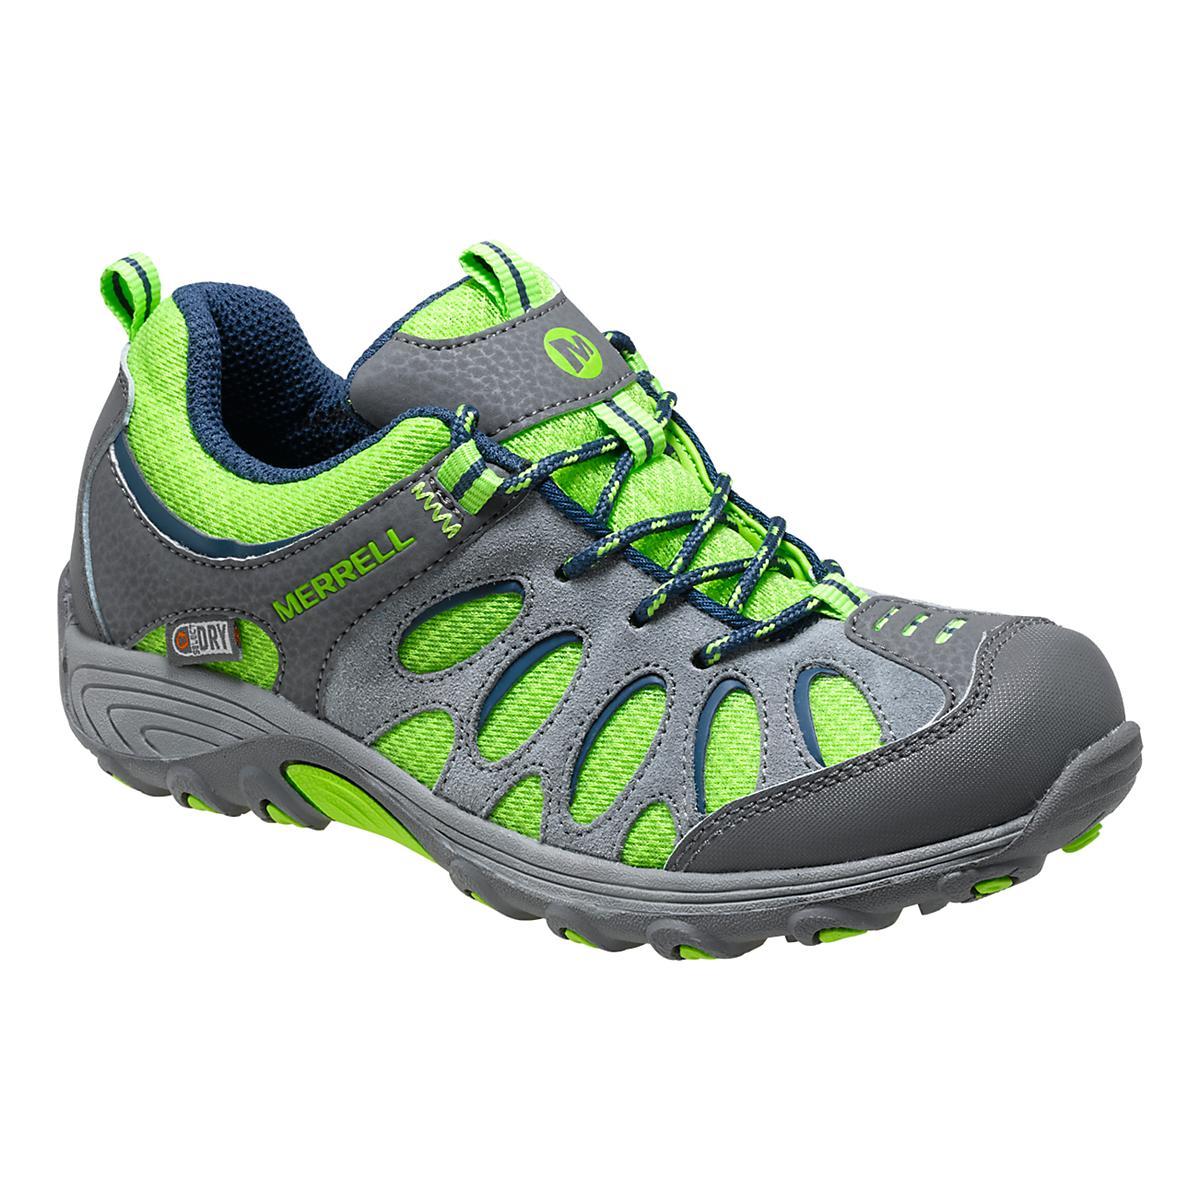 Merrell Chameleon Low Lace Waterproof Hiking Shoe